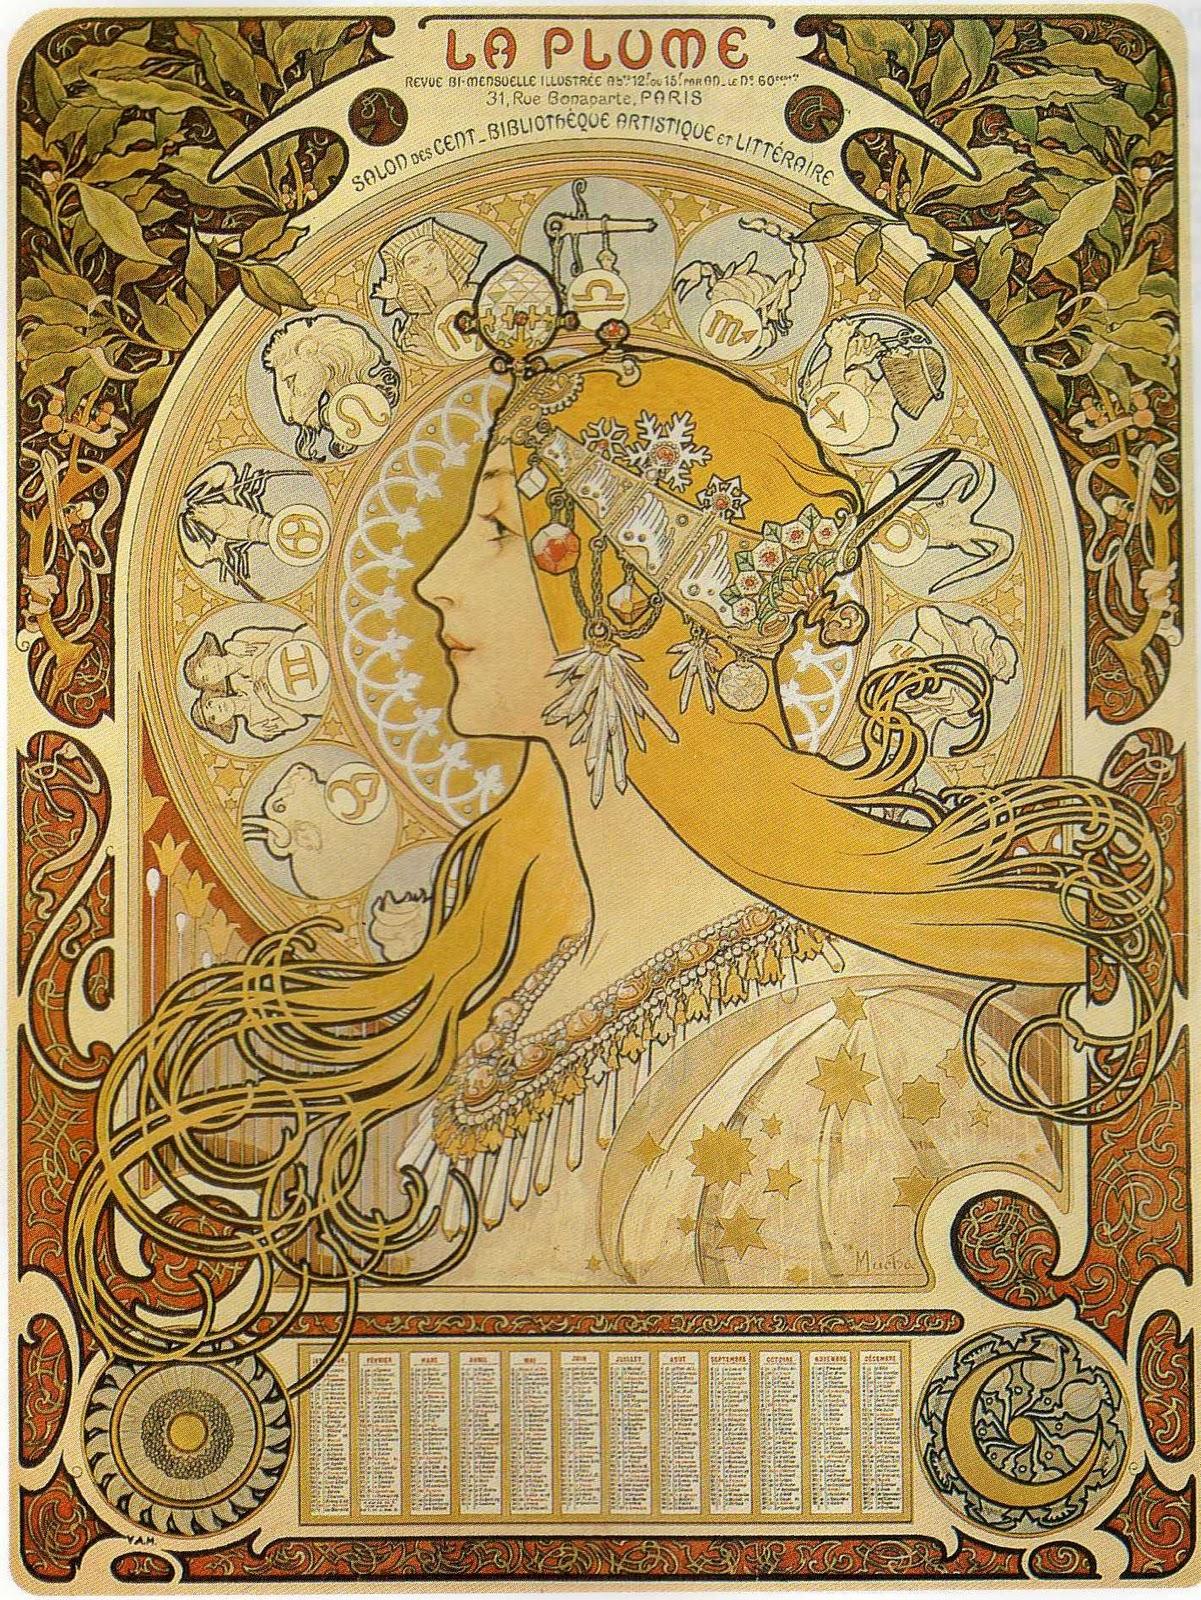 [48+] Art Nouveau Wallpaper Designs on WallpaperSafari